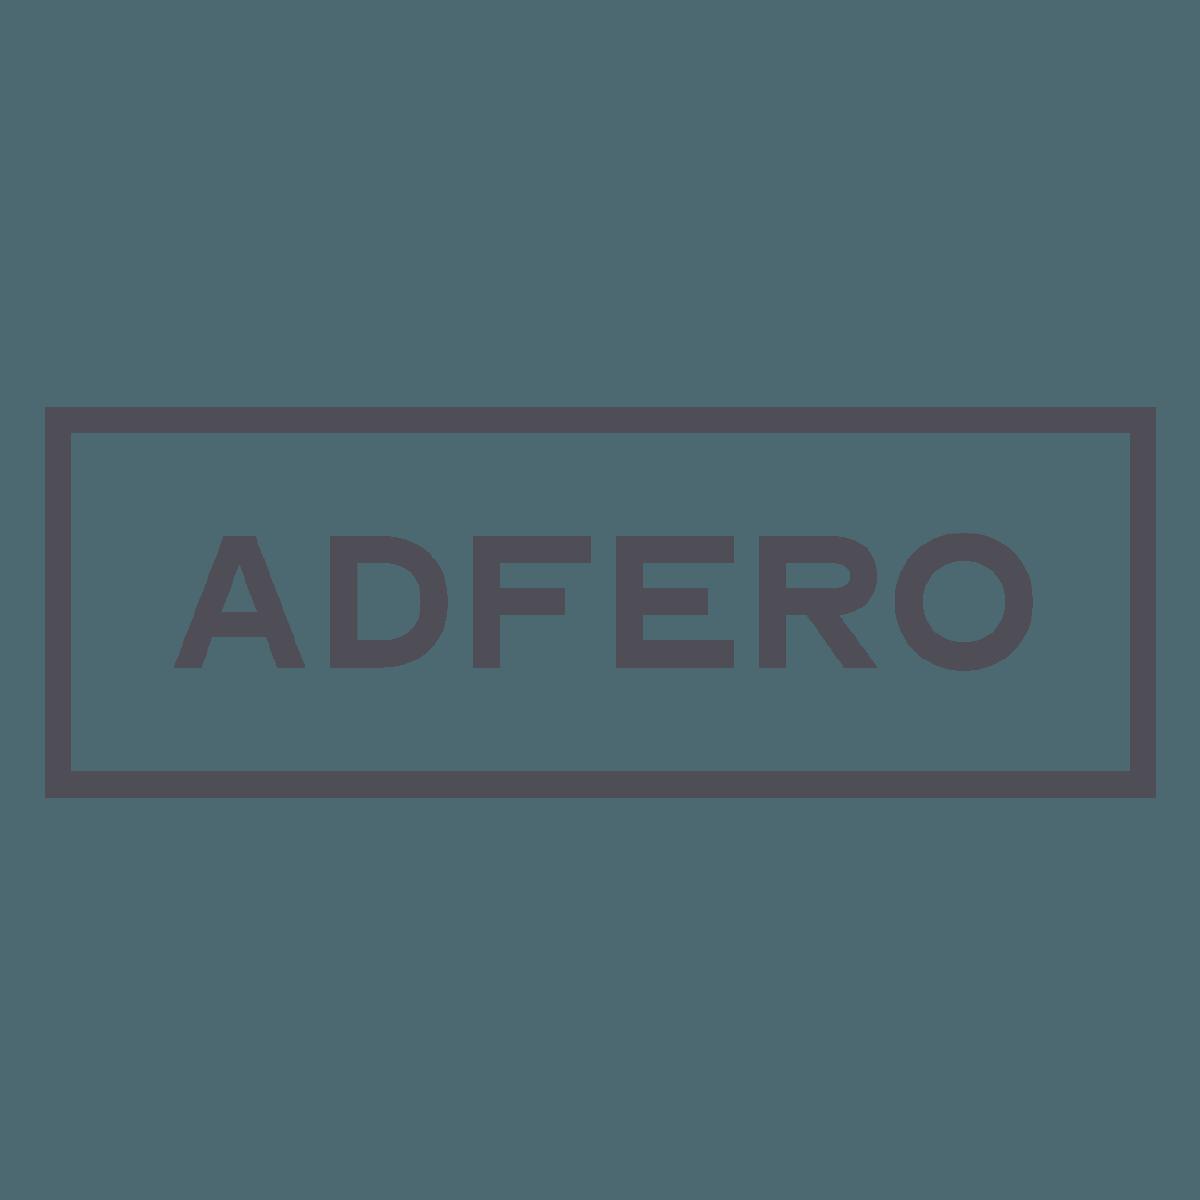 Adfero_Logo.png